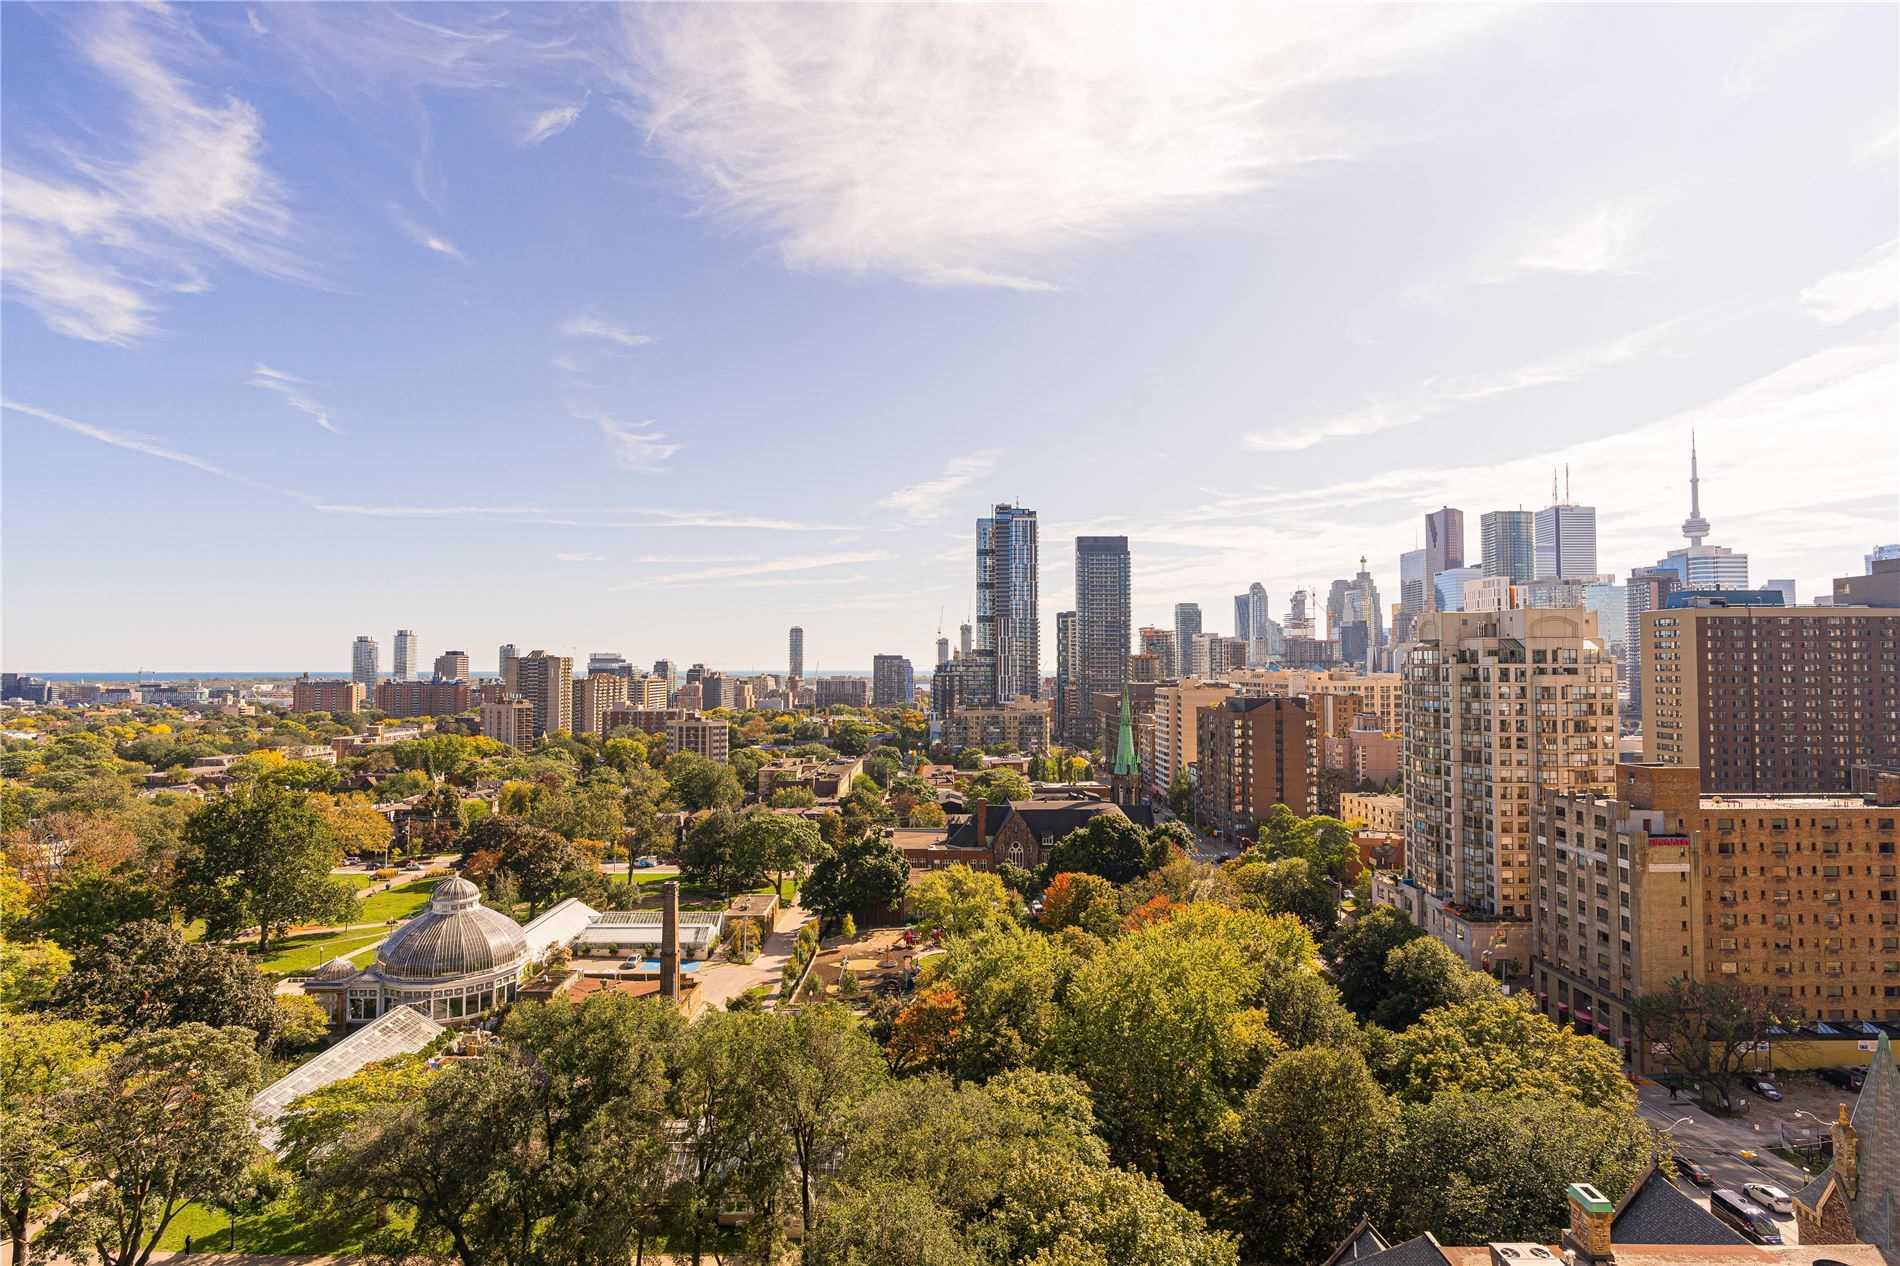 130 Carlton St, Toronto, Ontario M5A4K3, 2 Bedrooms Bedrooms, 6 Rooms Rooms,3 BathroomsBathrooms,Condo Apt,For Sale,Carlton,C5088183